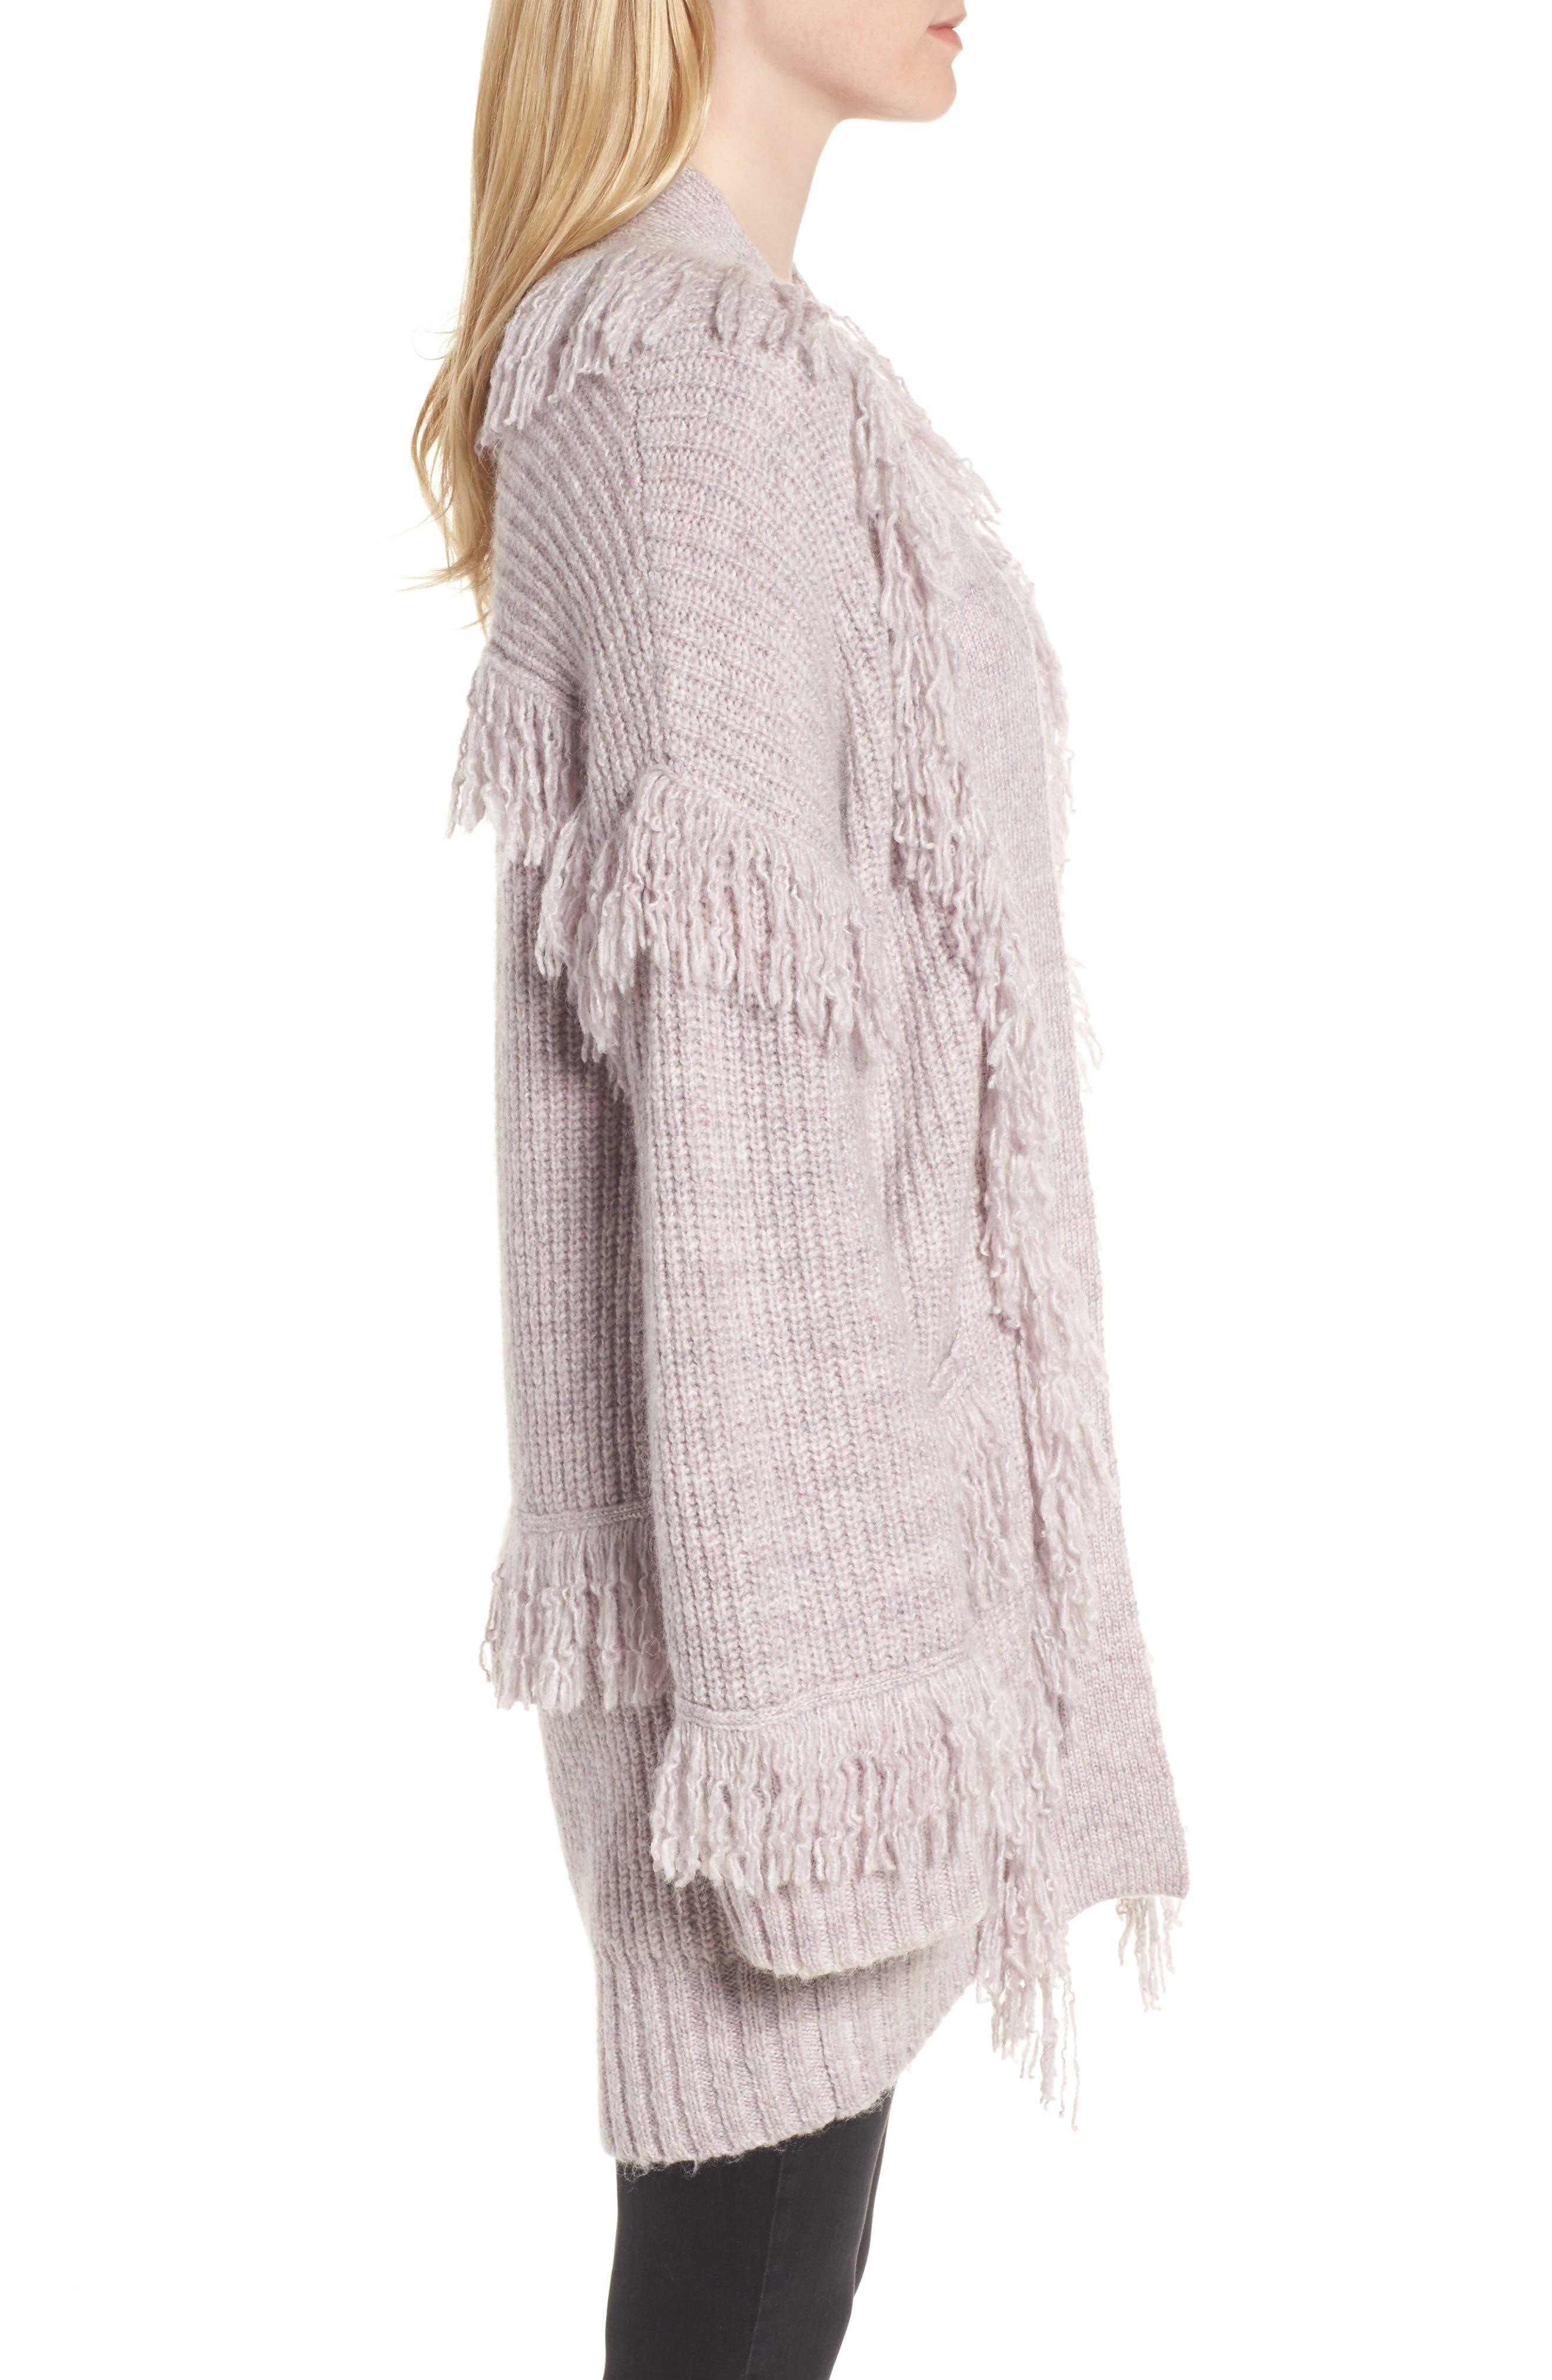 Berea Fringe Cardigan Sweater,                             Alternate thumbnail 3, color,                             684